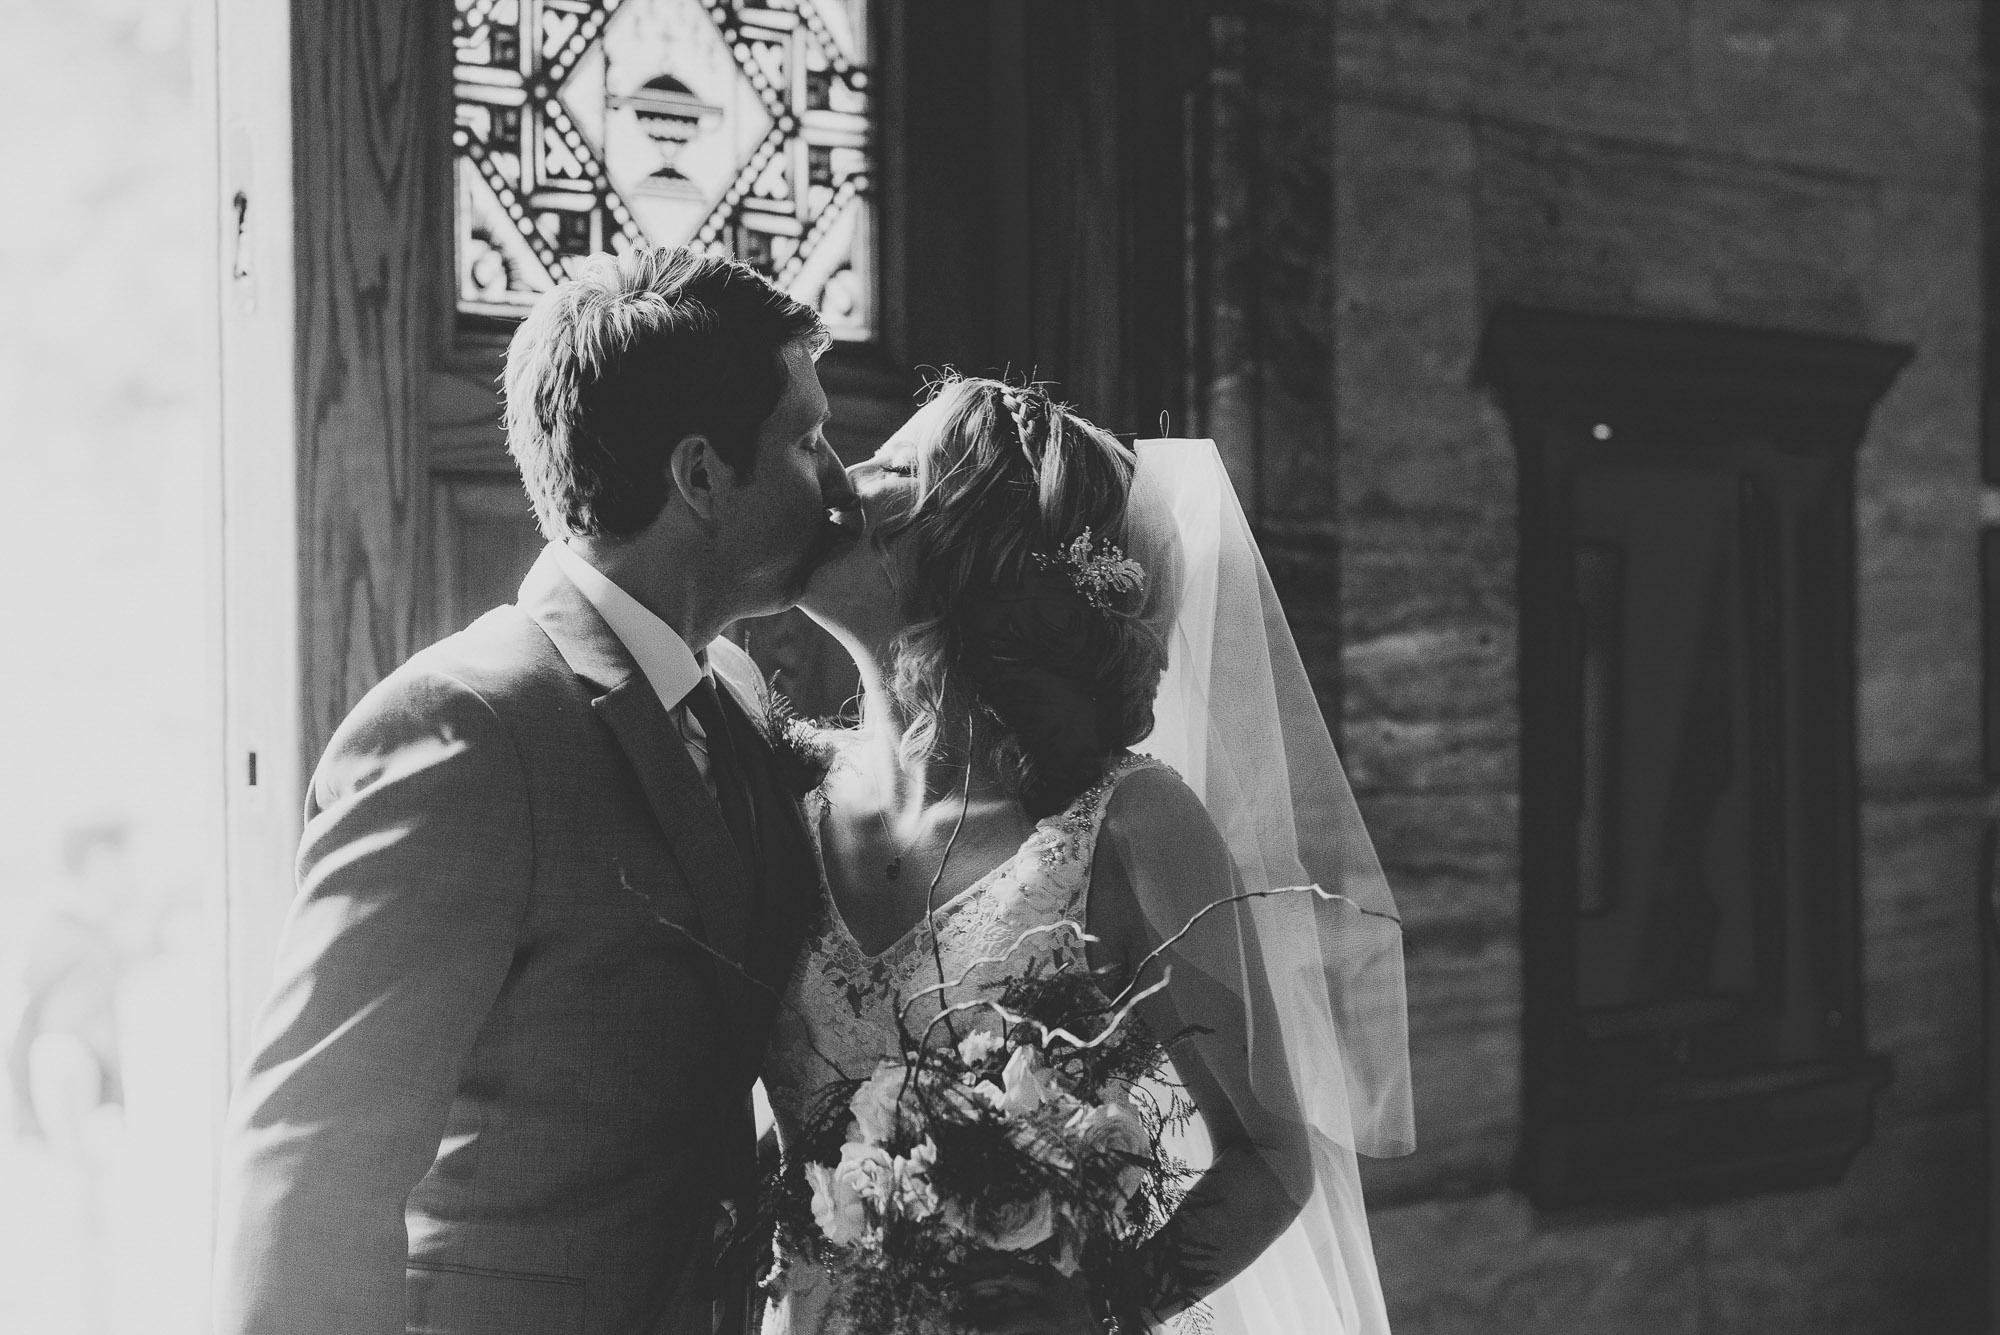 91elopement-photographer-colorado-colorado_wedding_photographer_brian&kendall_0658_bw.jpg